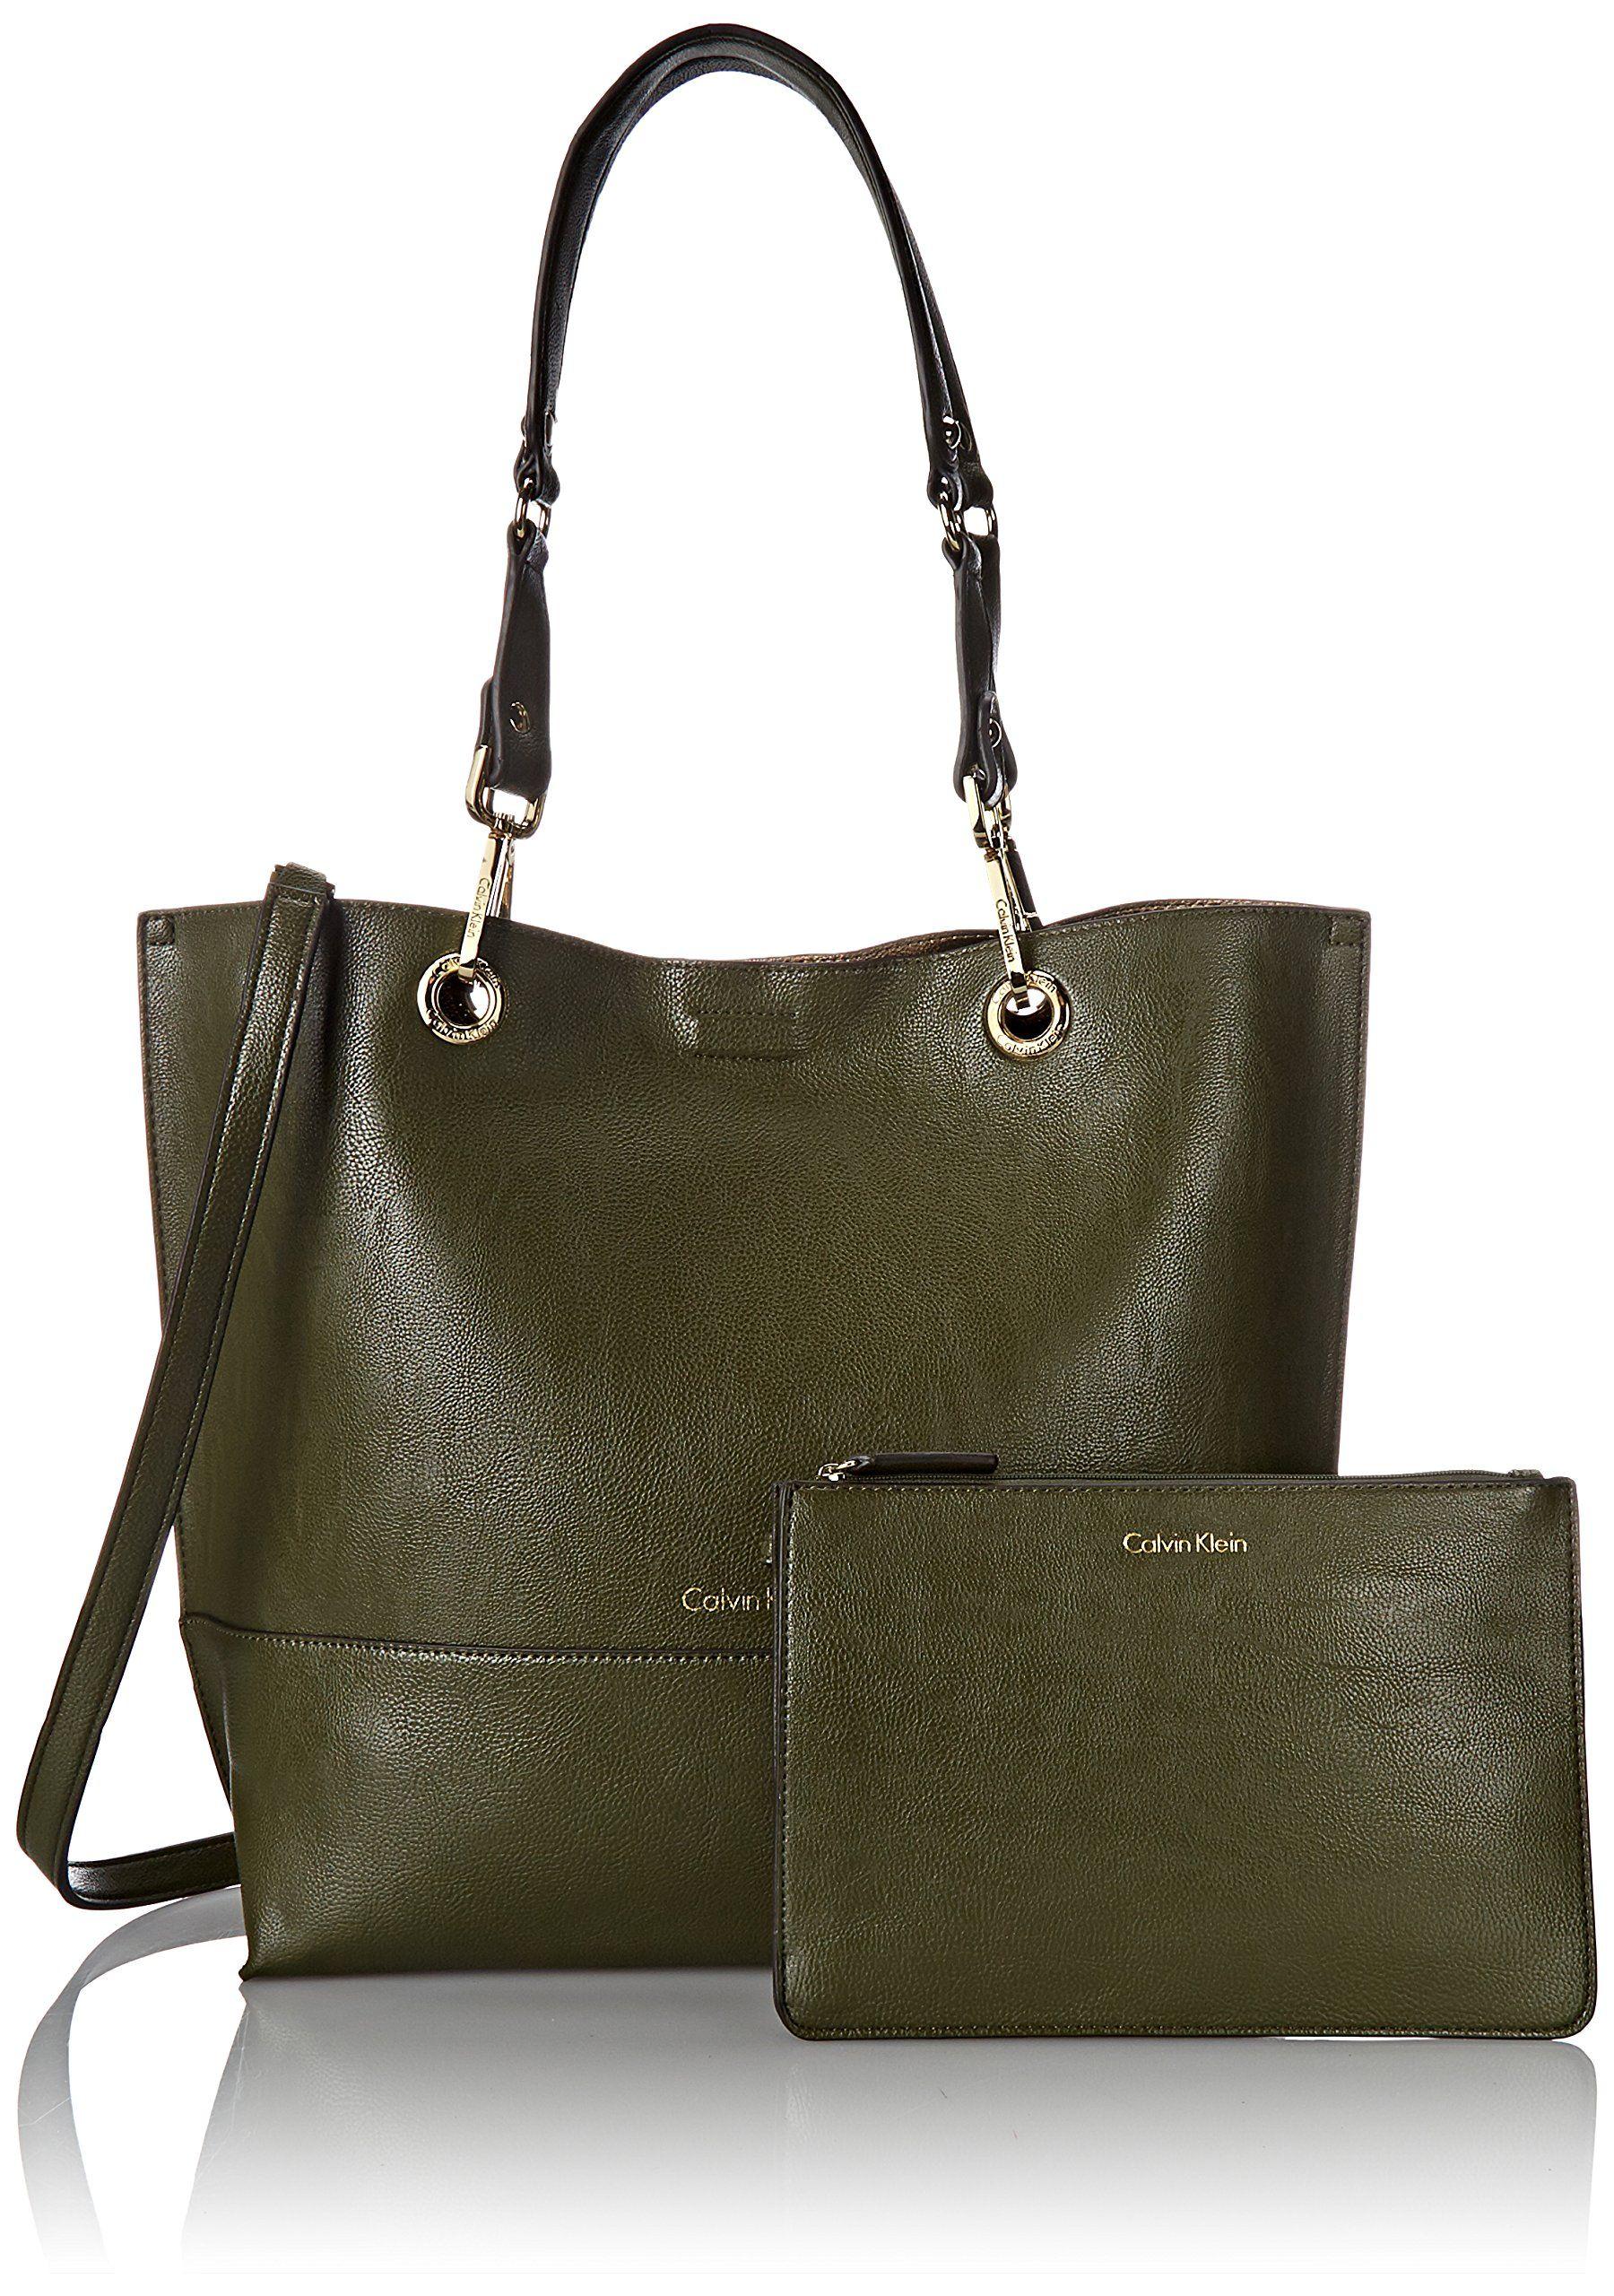 eadd275b7726 Calvin Klein Calvin Klein Reversible Tote Bag, Olive/Antique Bronze, One  Size: Handbags: Amazon.com